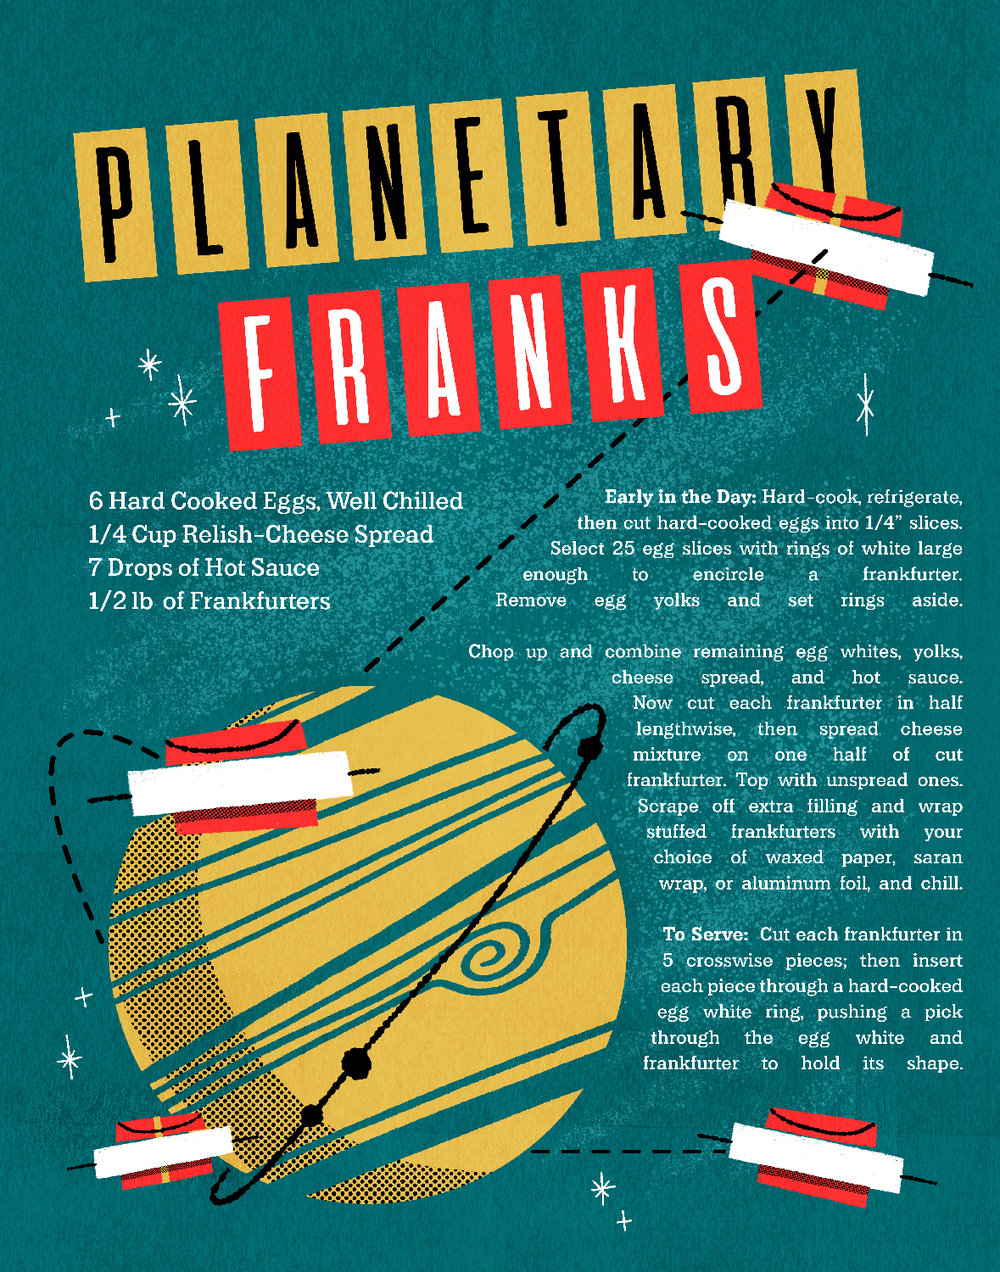 Planetary Franks Vintage Recipe